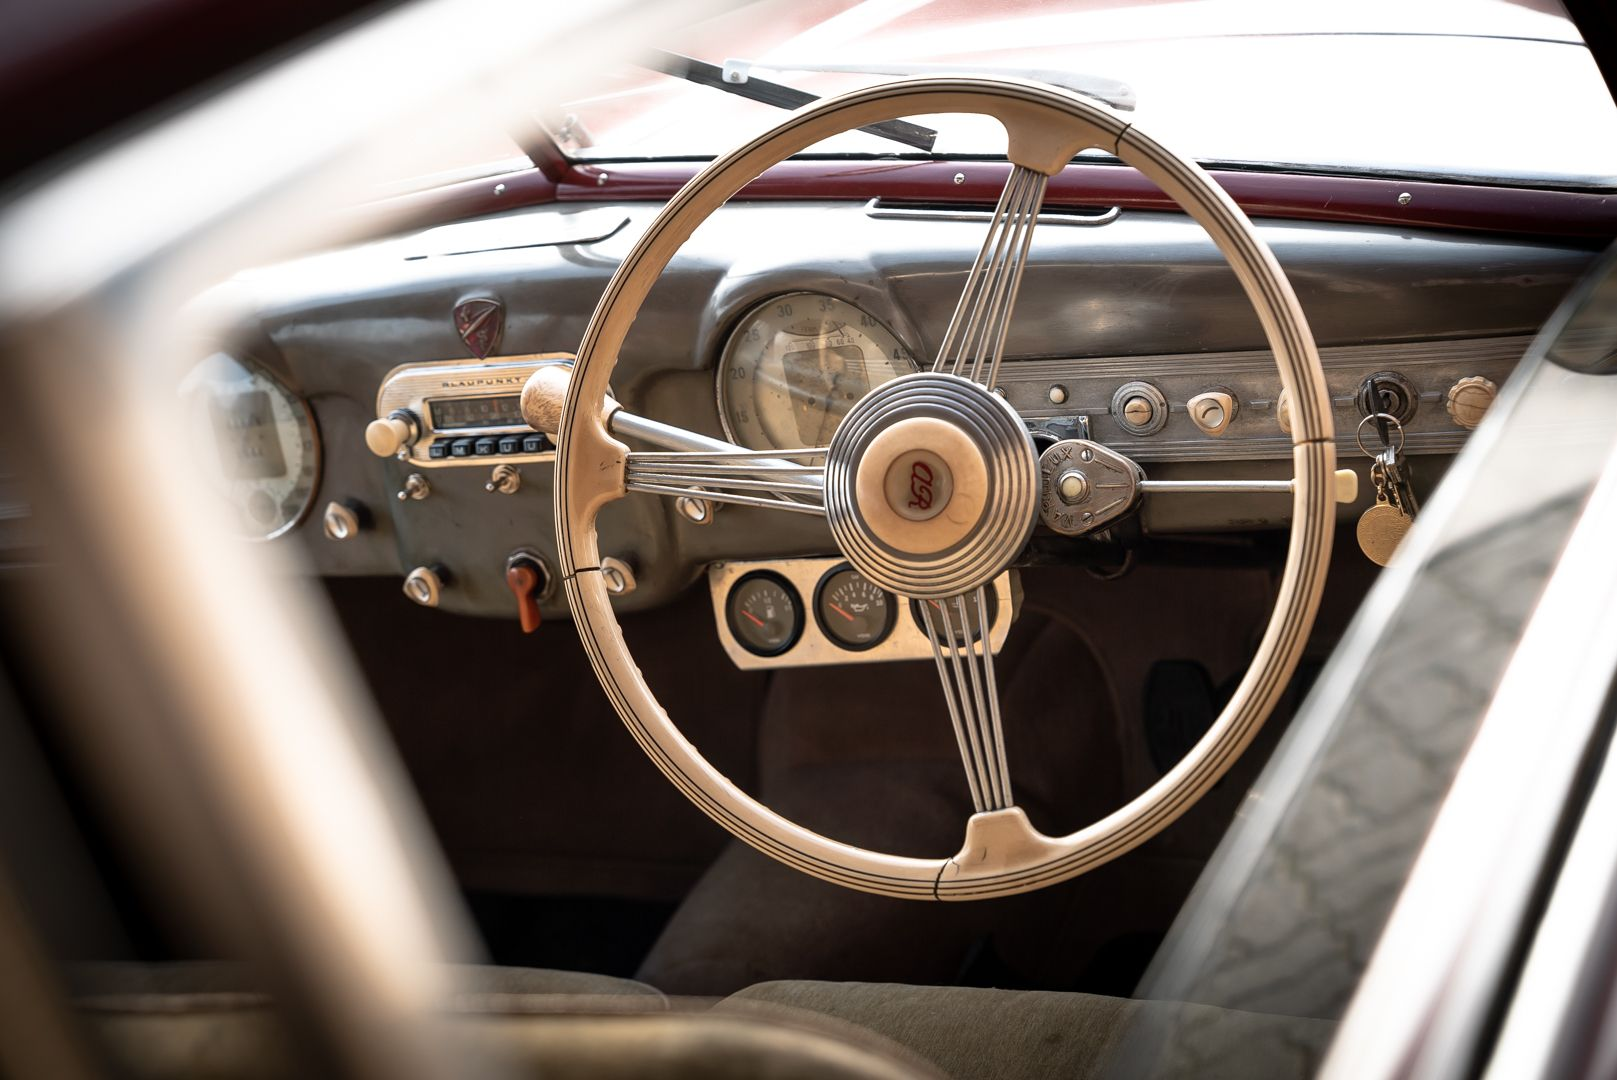 1947 Alfa Romeo Freccia d'oro 6C 2500 Sport 61730